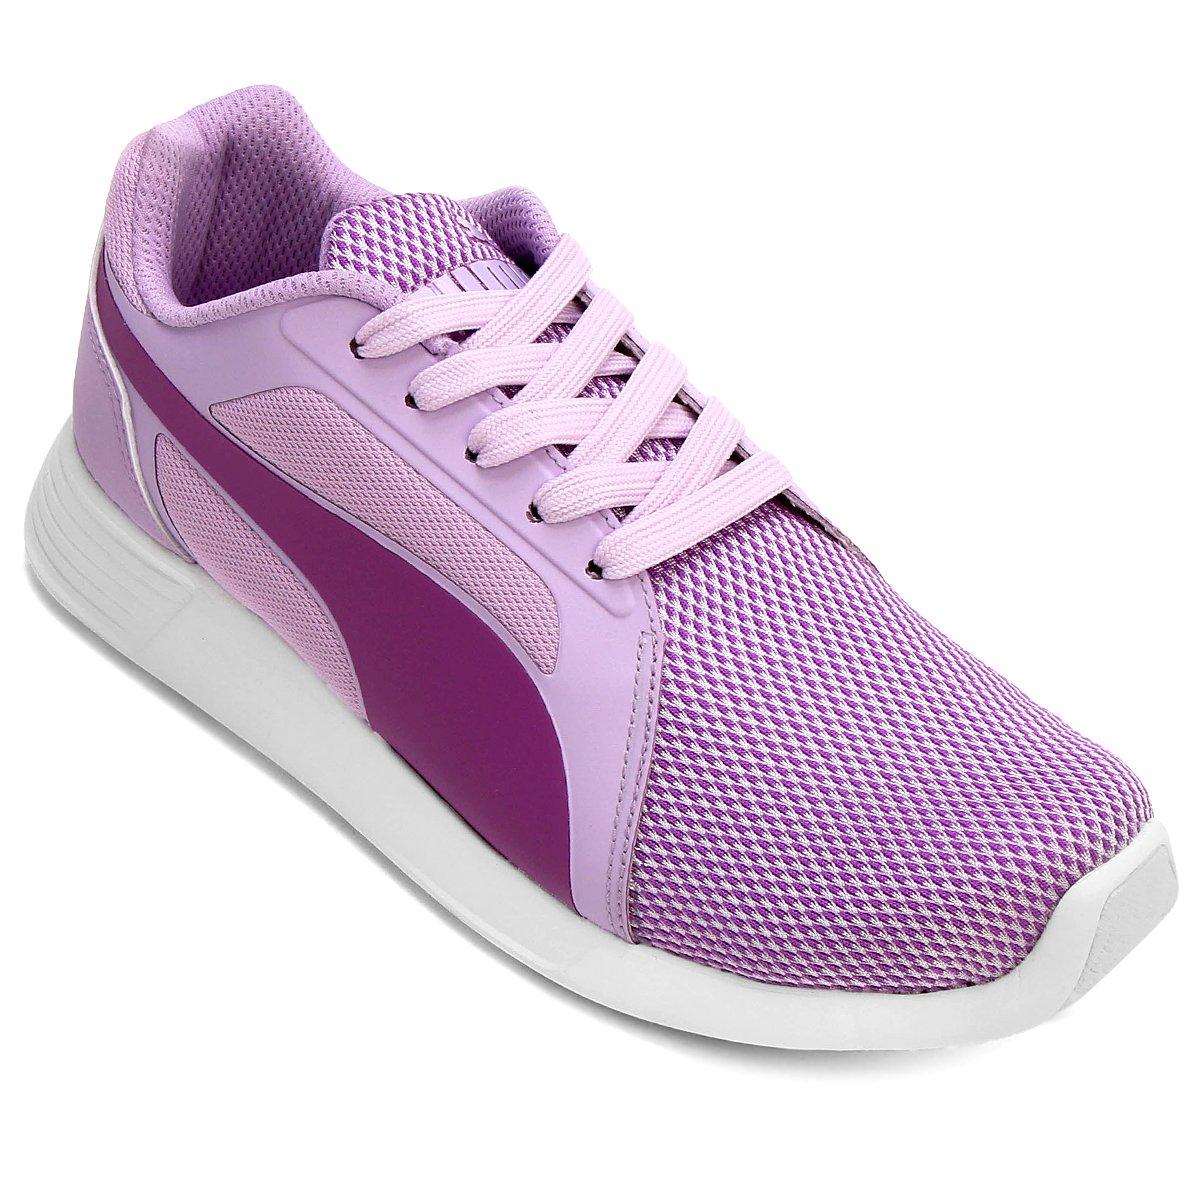 6eea013d12e61 FornecedorNetshoes. Tênis Puma ST Trainer Evo Tech Feminino